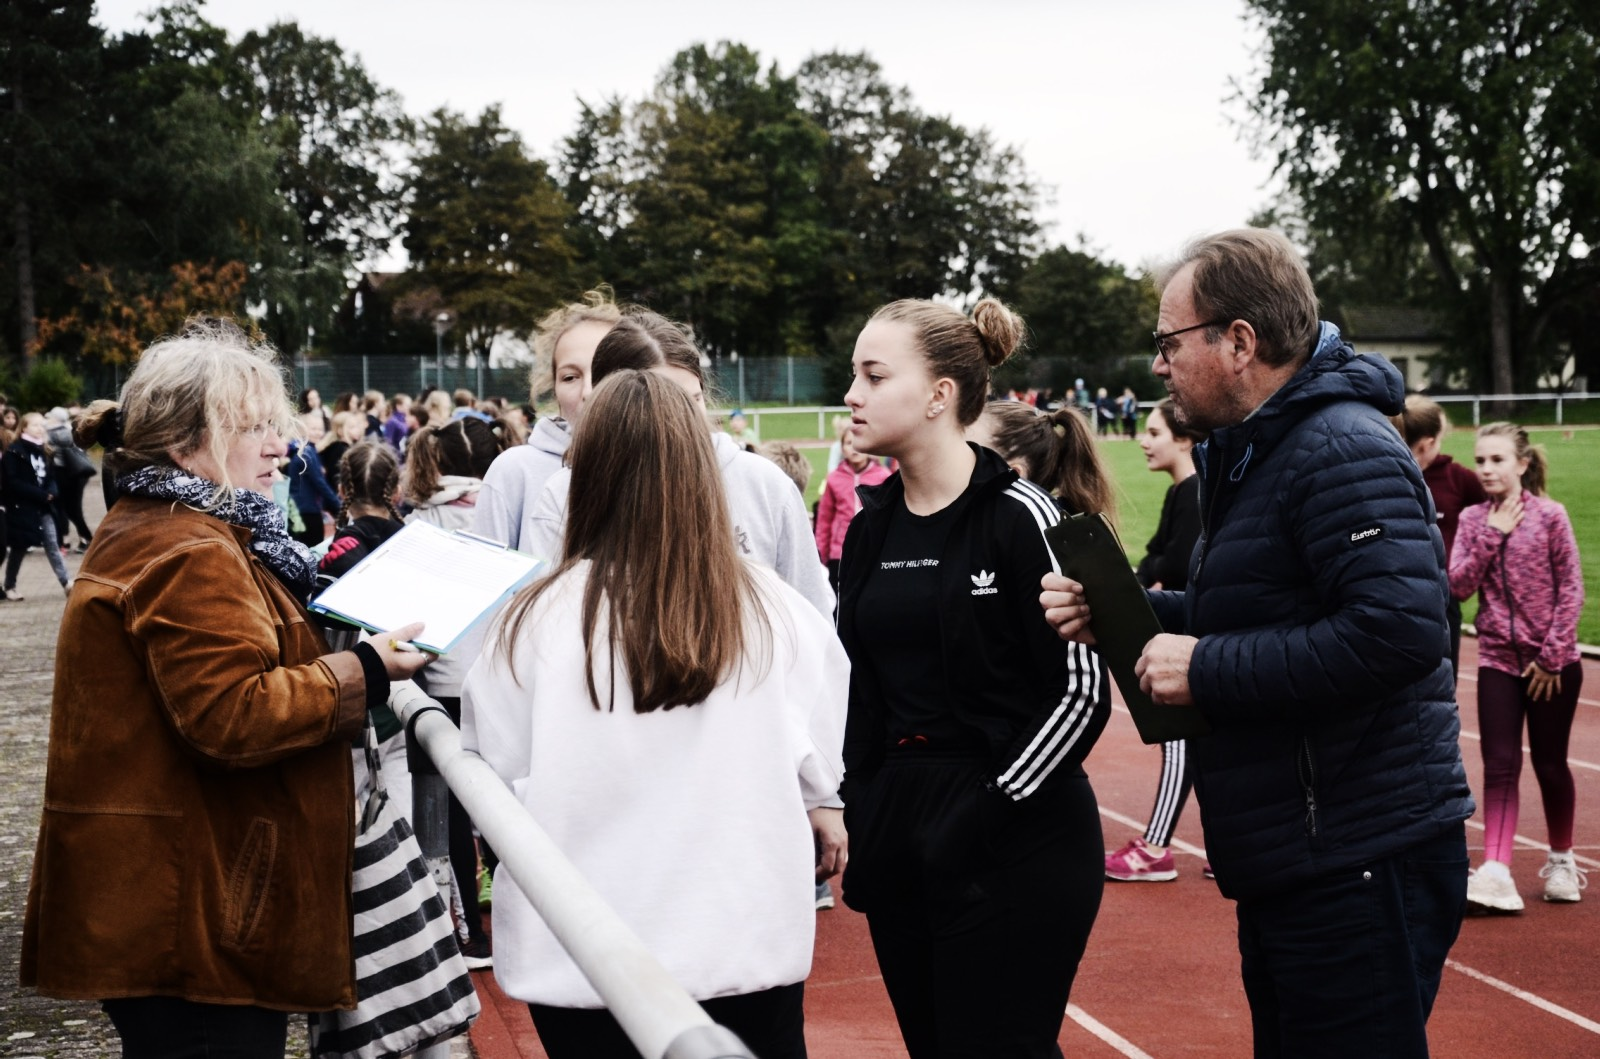 hsg-sportfest-2019-05